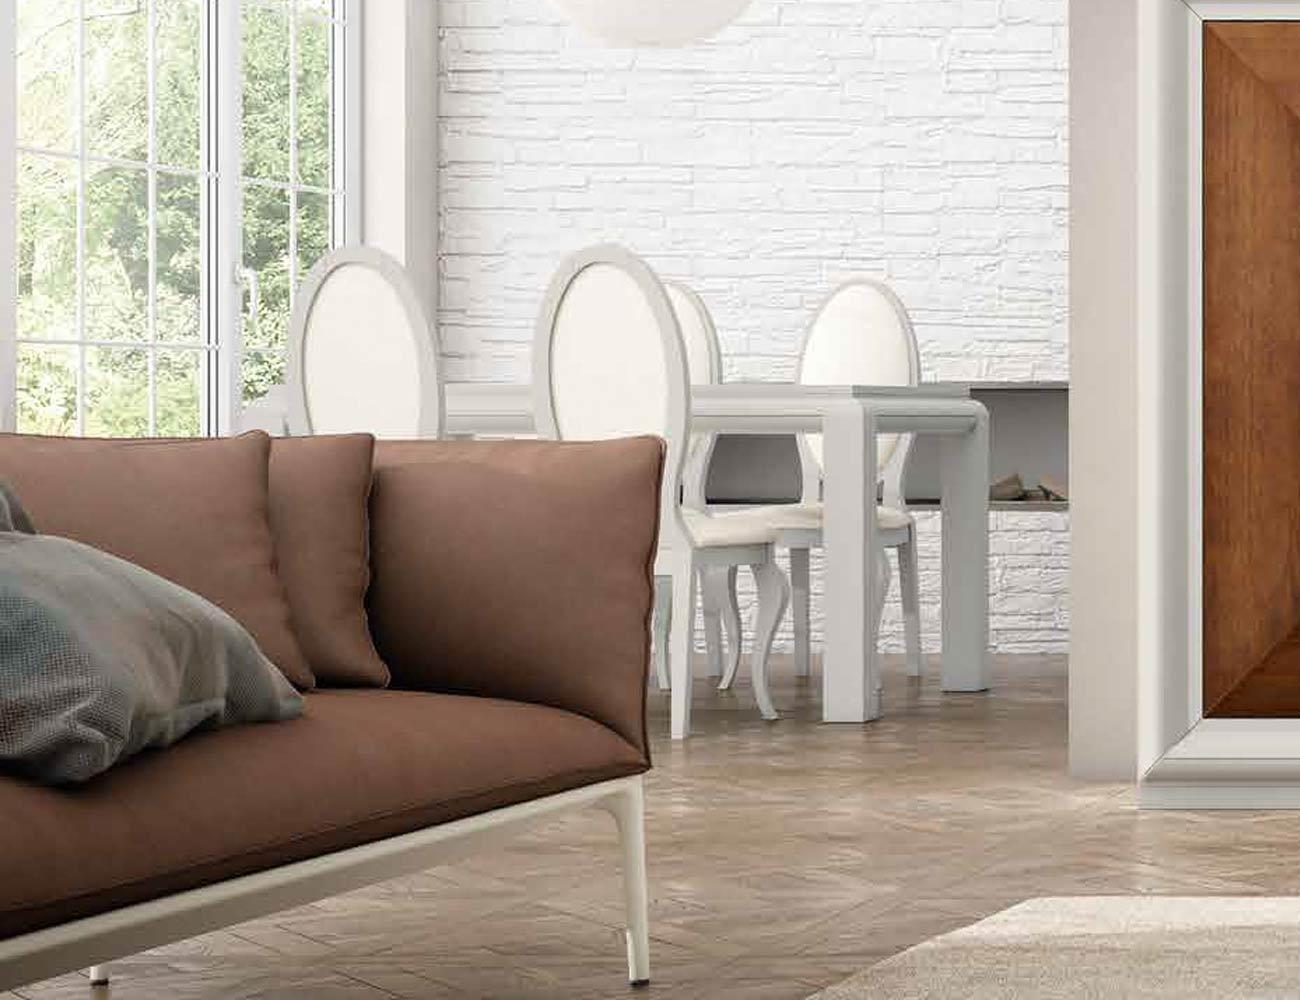 Mesa sillas composicion 27